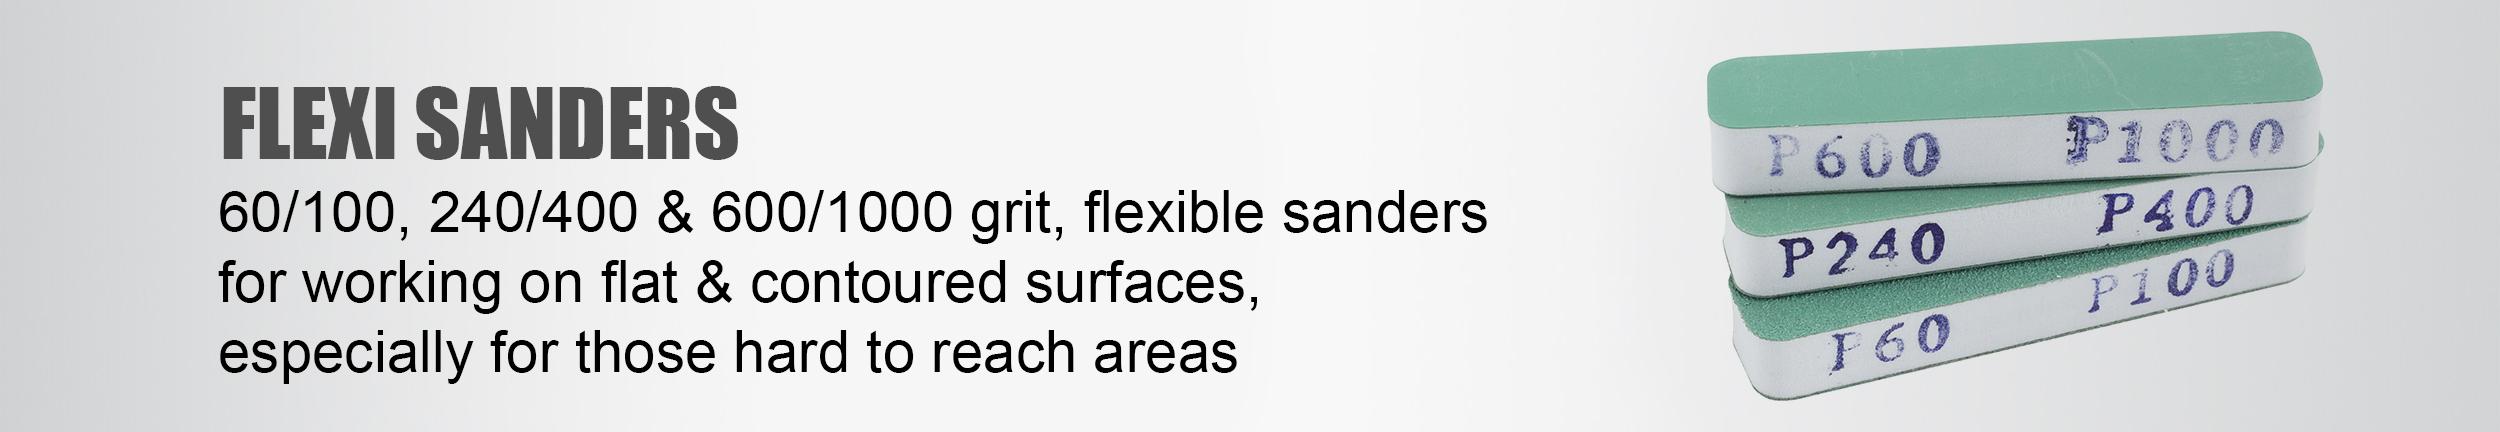 Flexi Sanders